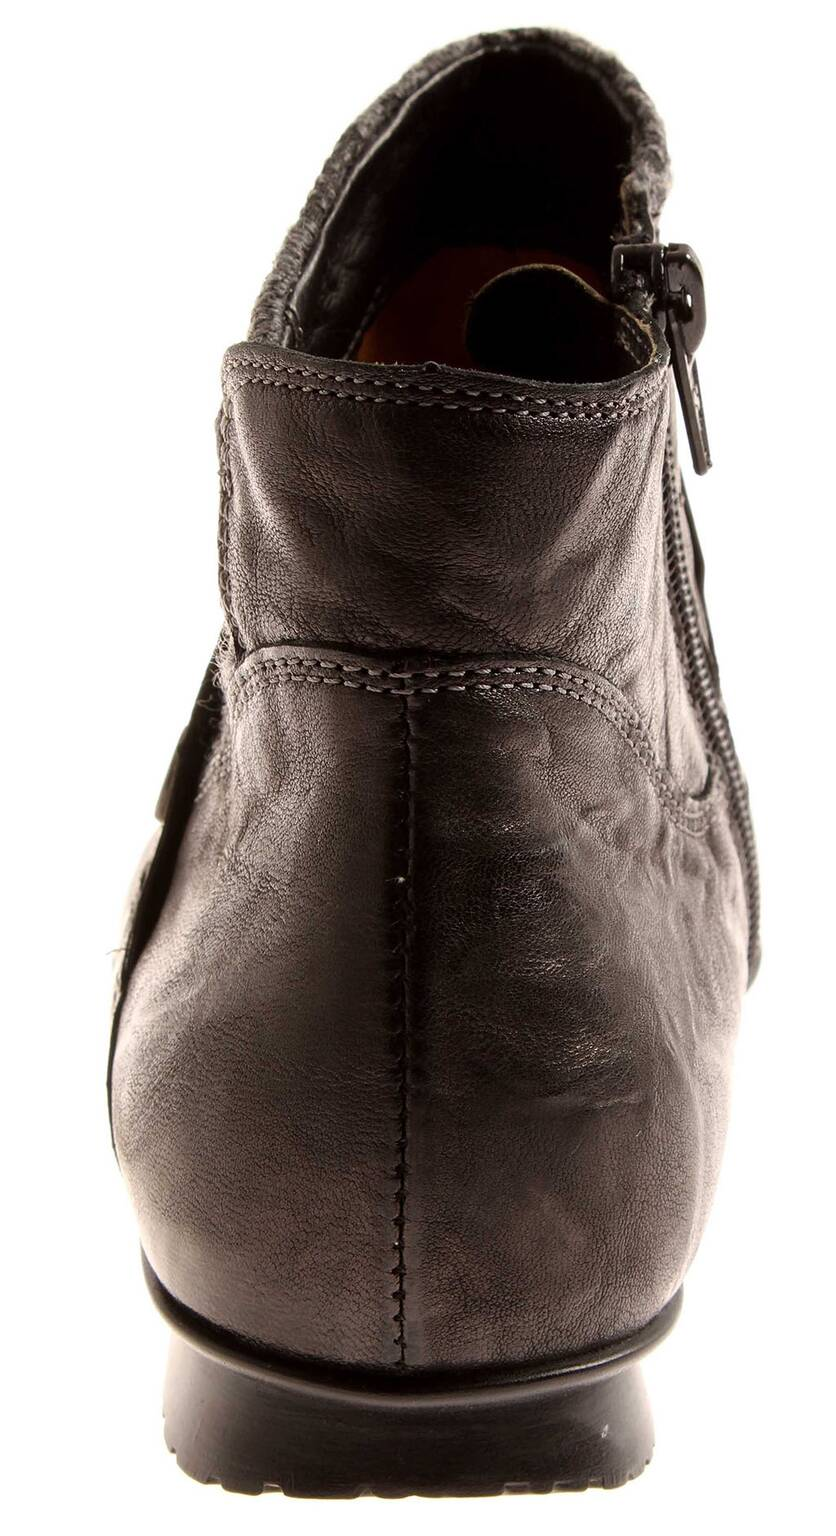 innovative design 61f50 43653 Details zu Think! Stiefeletten Lederschuhe Damen Schuhe Leder CHILLI 83116